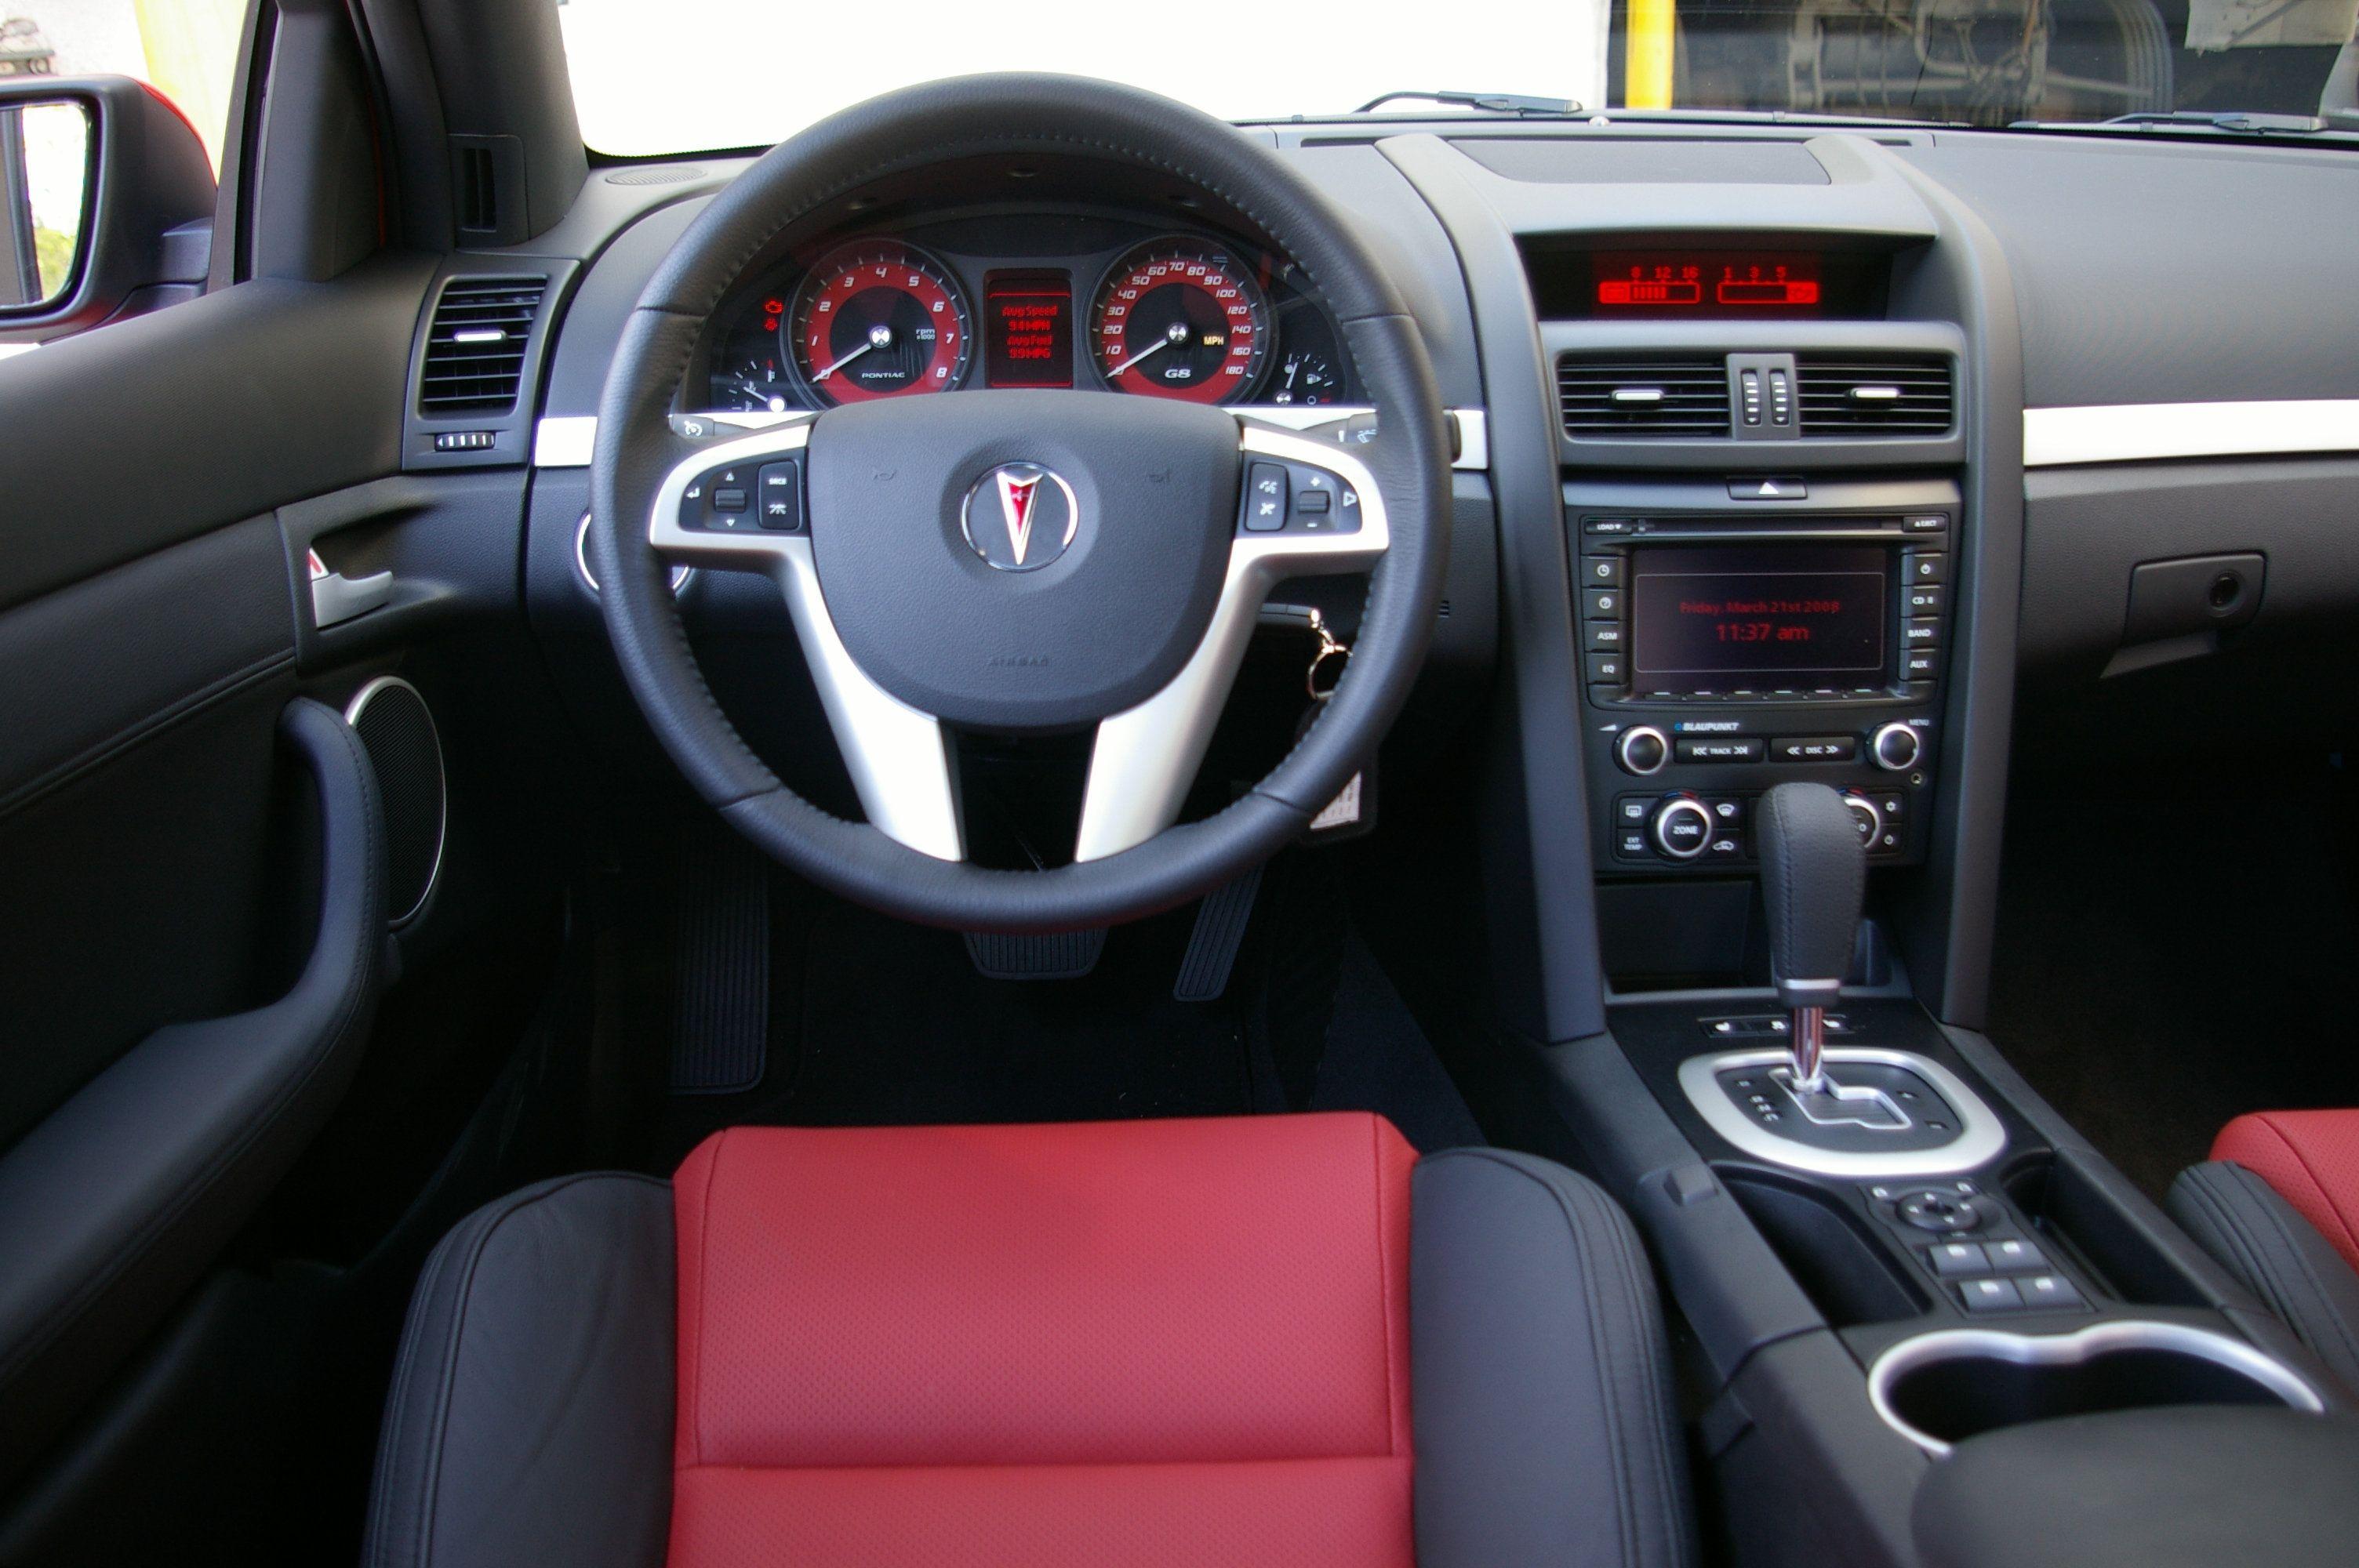 G8 Gt Red Google Search Car Dream Cars Pontiac G8 Cars